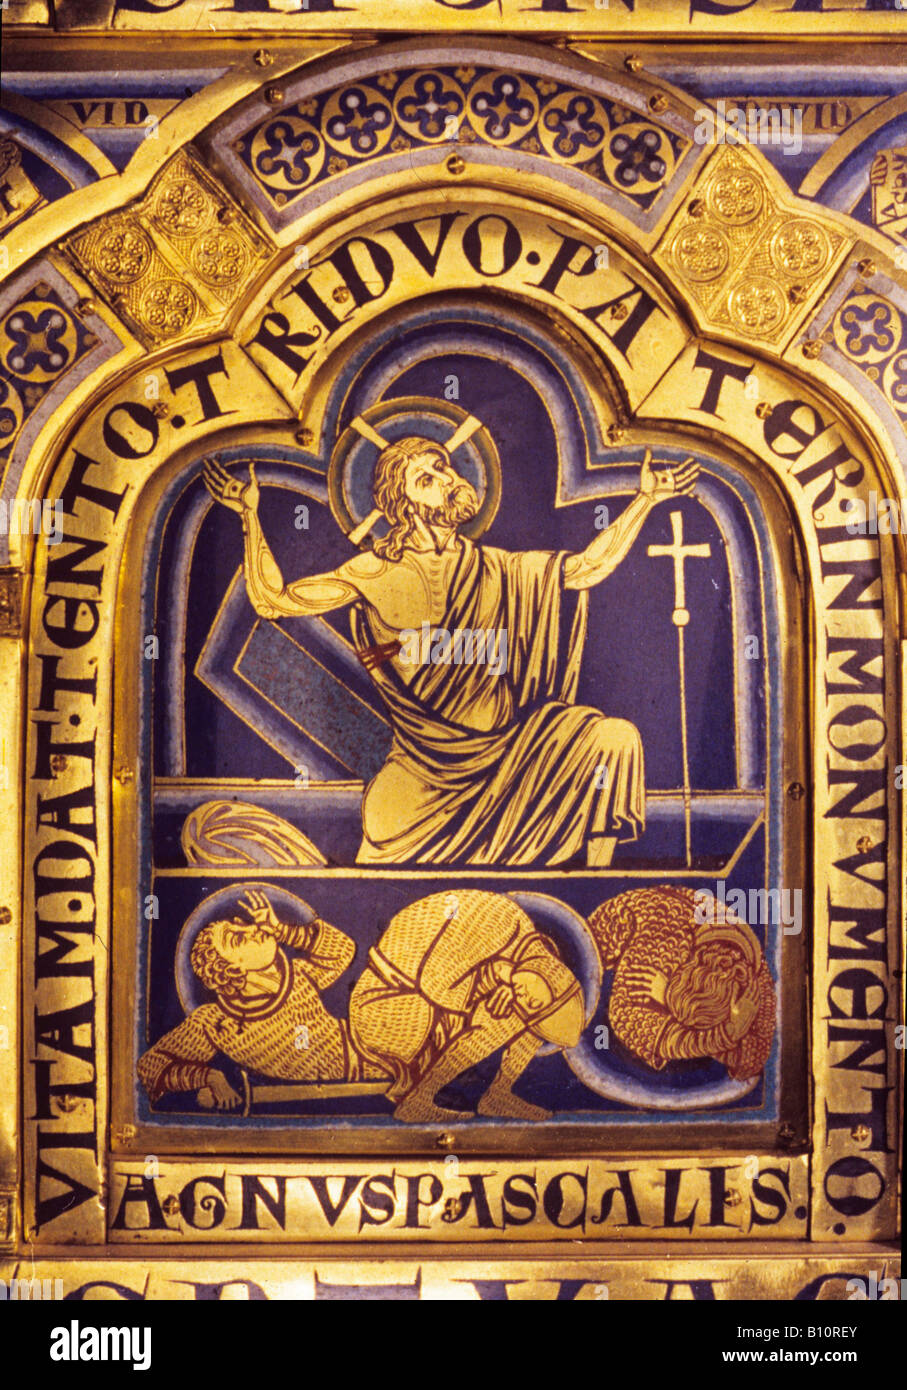 Resurrection The Verduner Altar 12th c Klosterneuberg Convent Austria  Copyright: AAA Collection Ltd - Stock Image